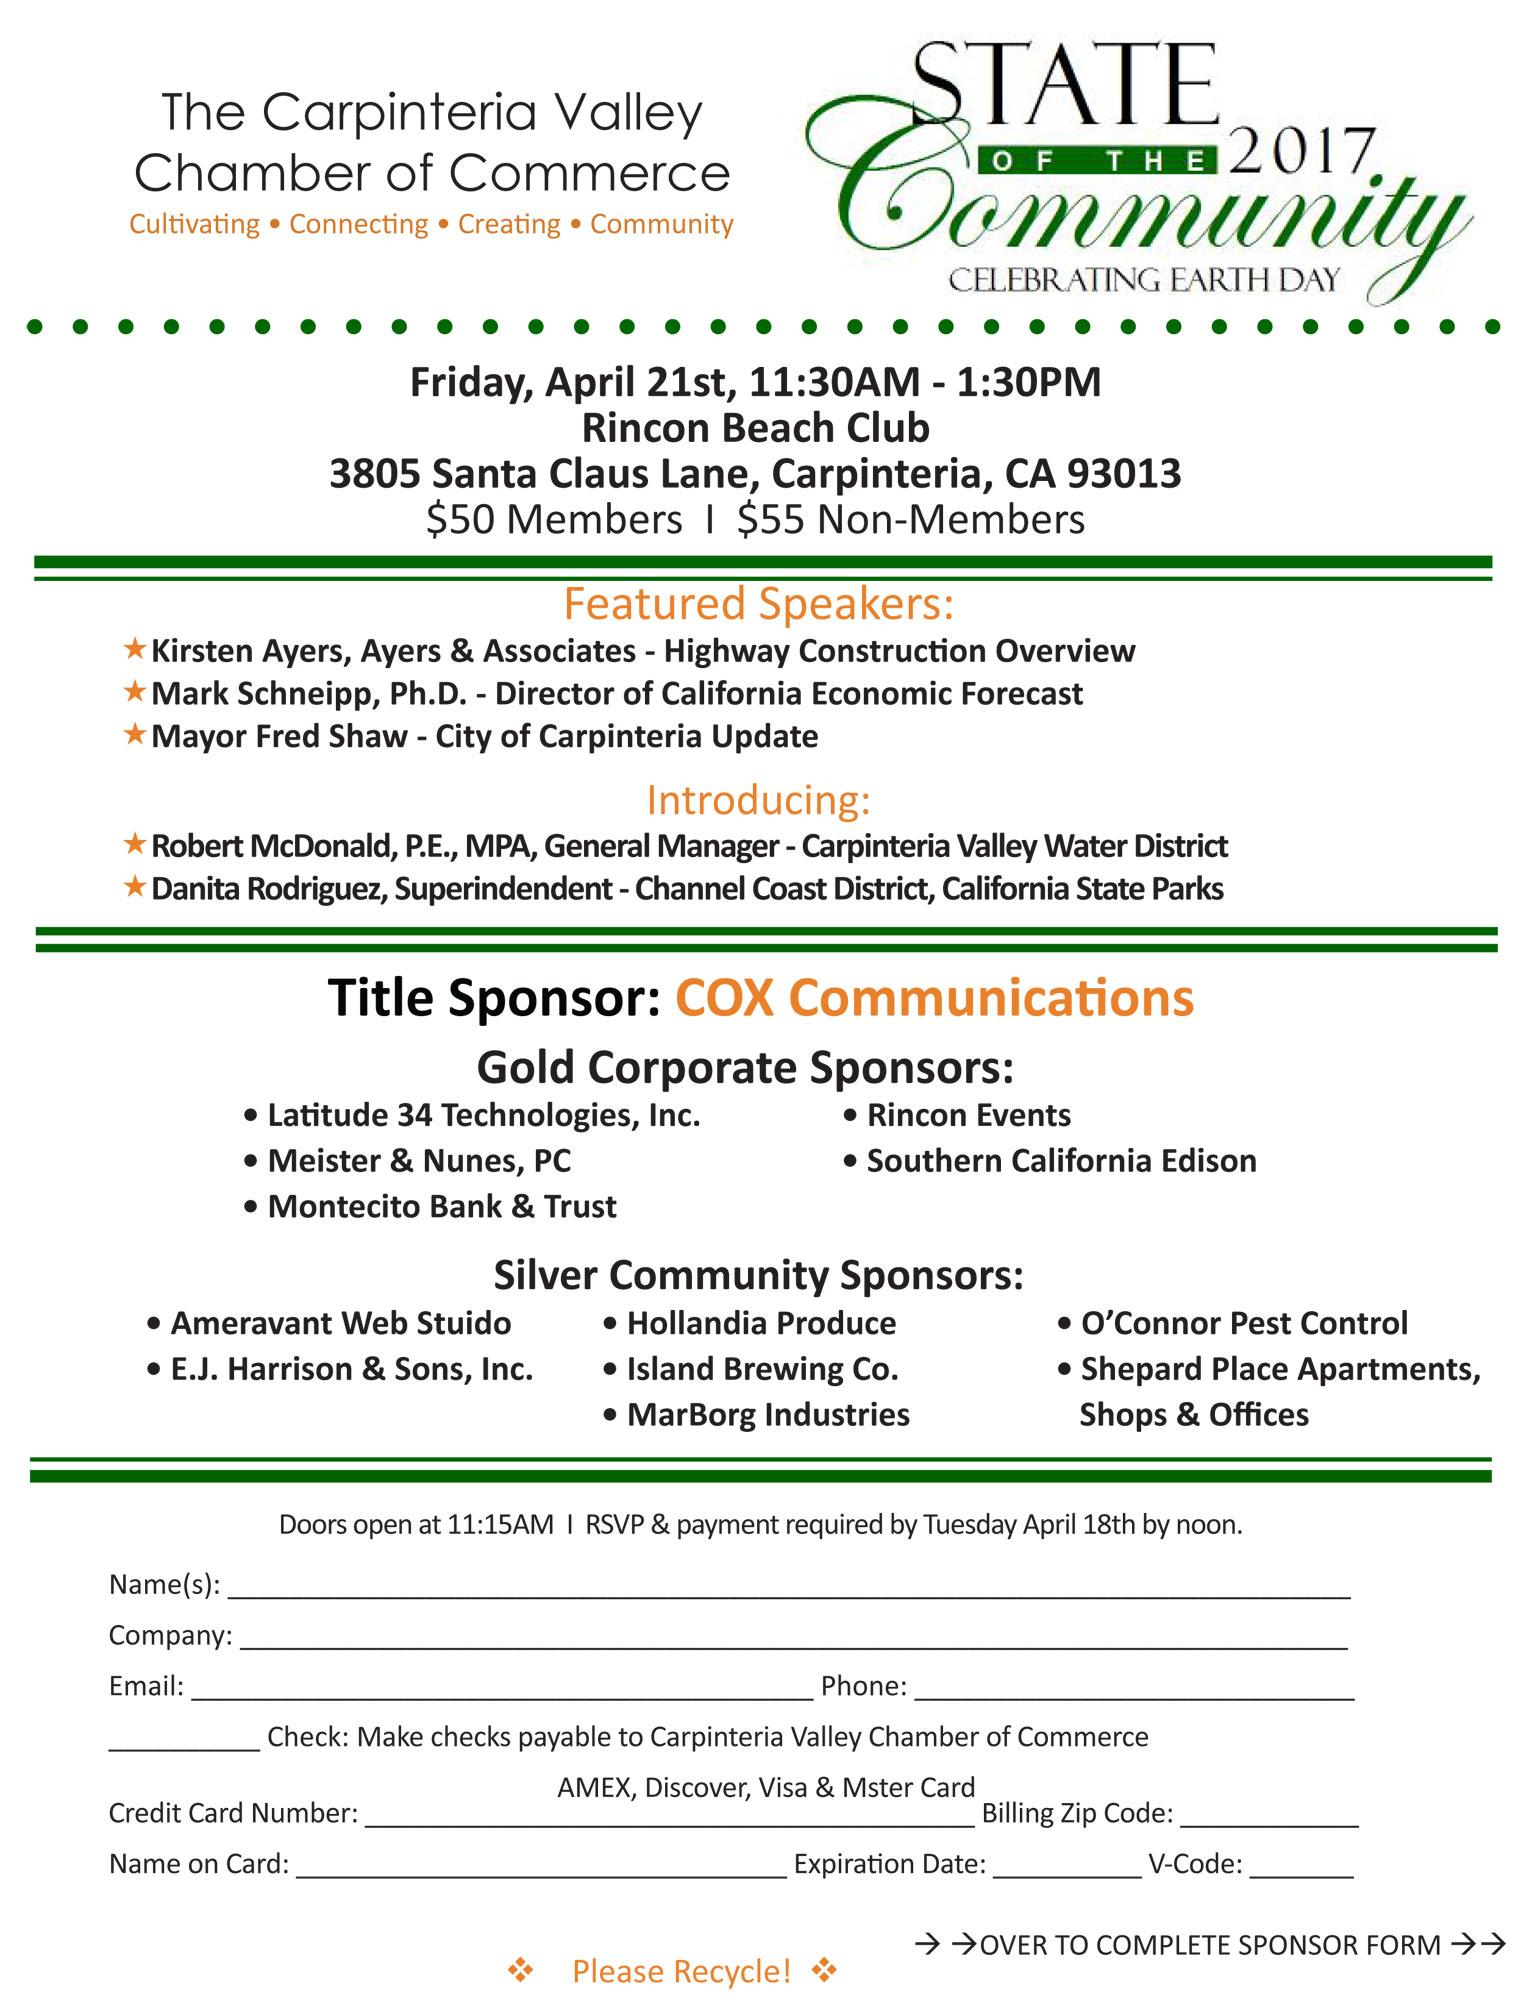 State of the Community Sponsorship pg 1